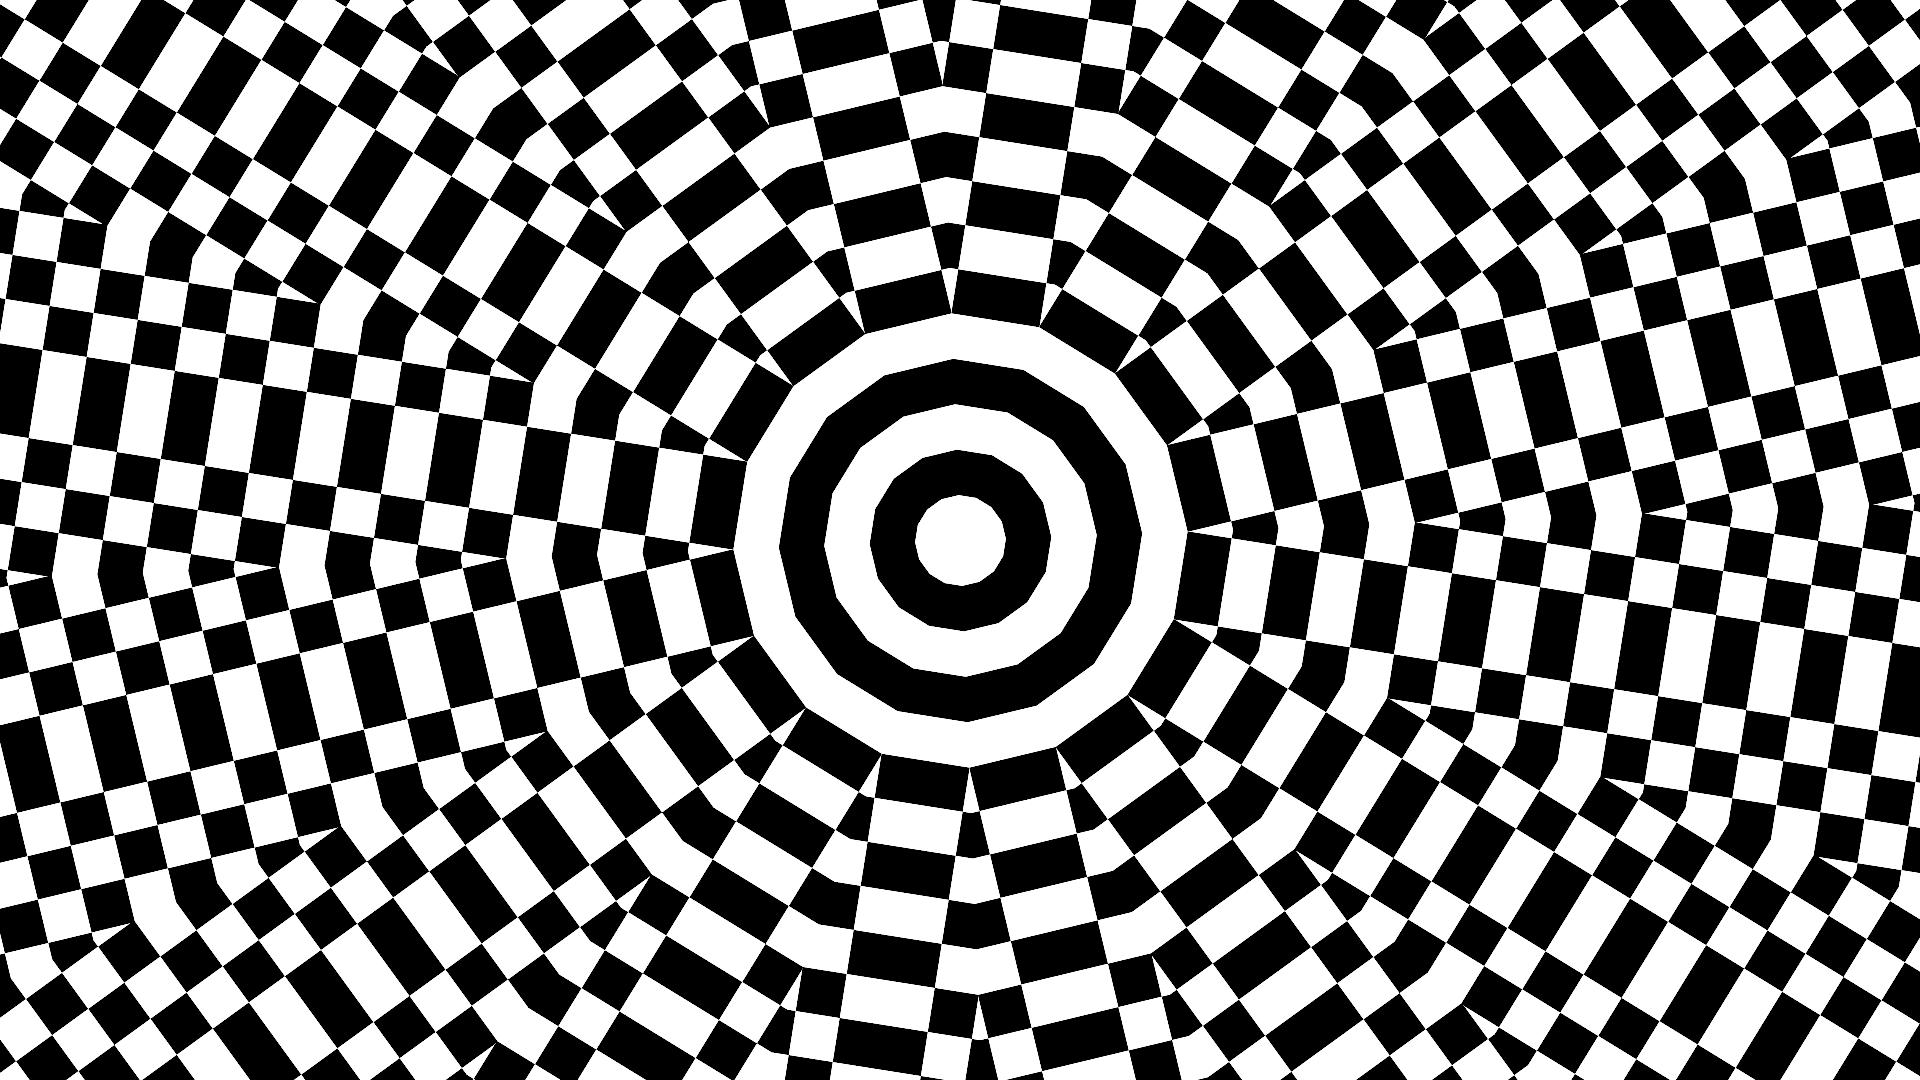 Kaleidoscope Hd Wallpaper Hintergrund 1920x1080 Id